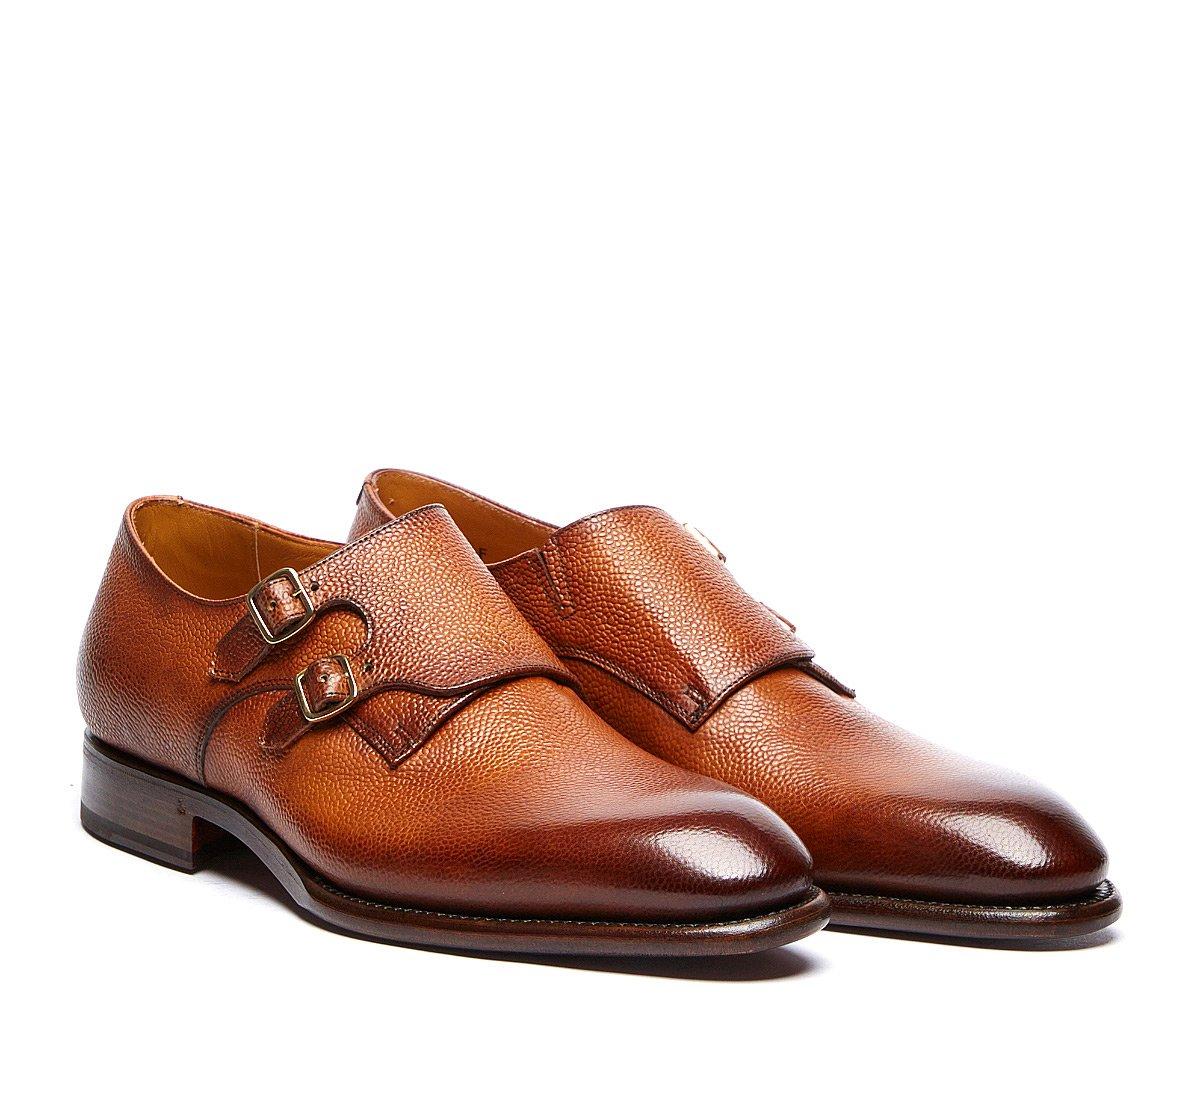 Fabi Flex Goodyear double-monk shoes